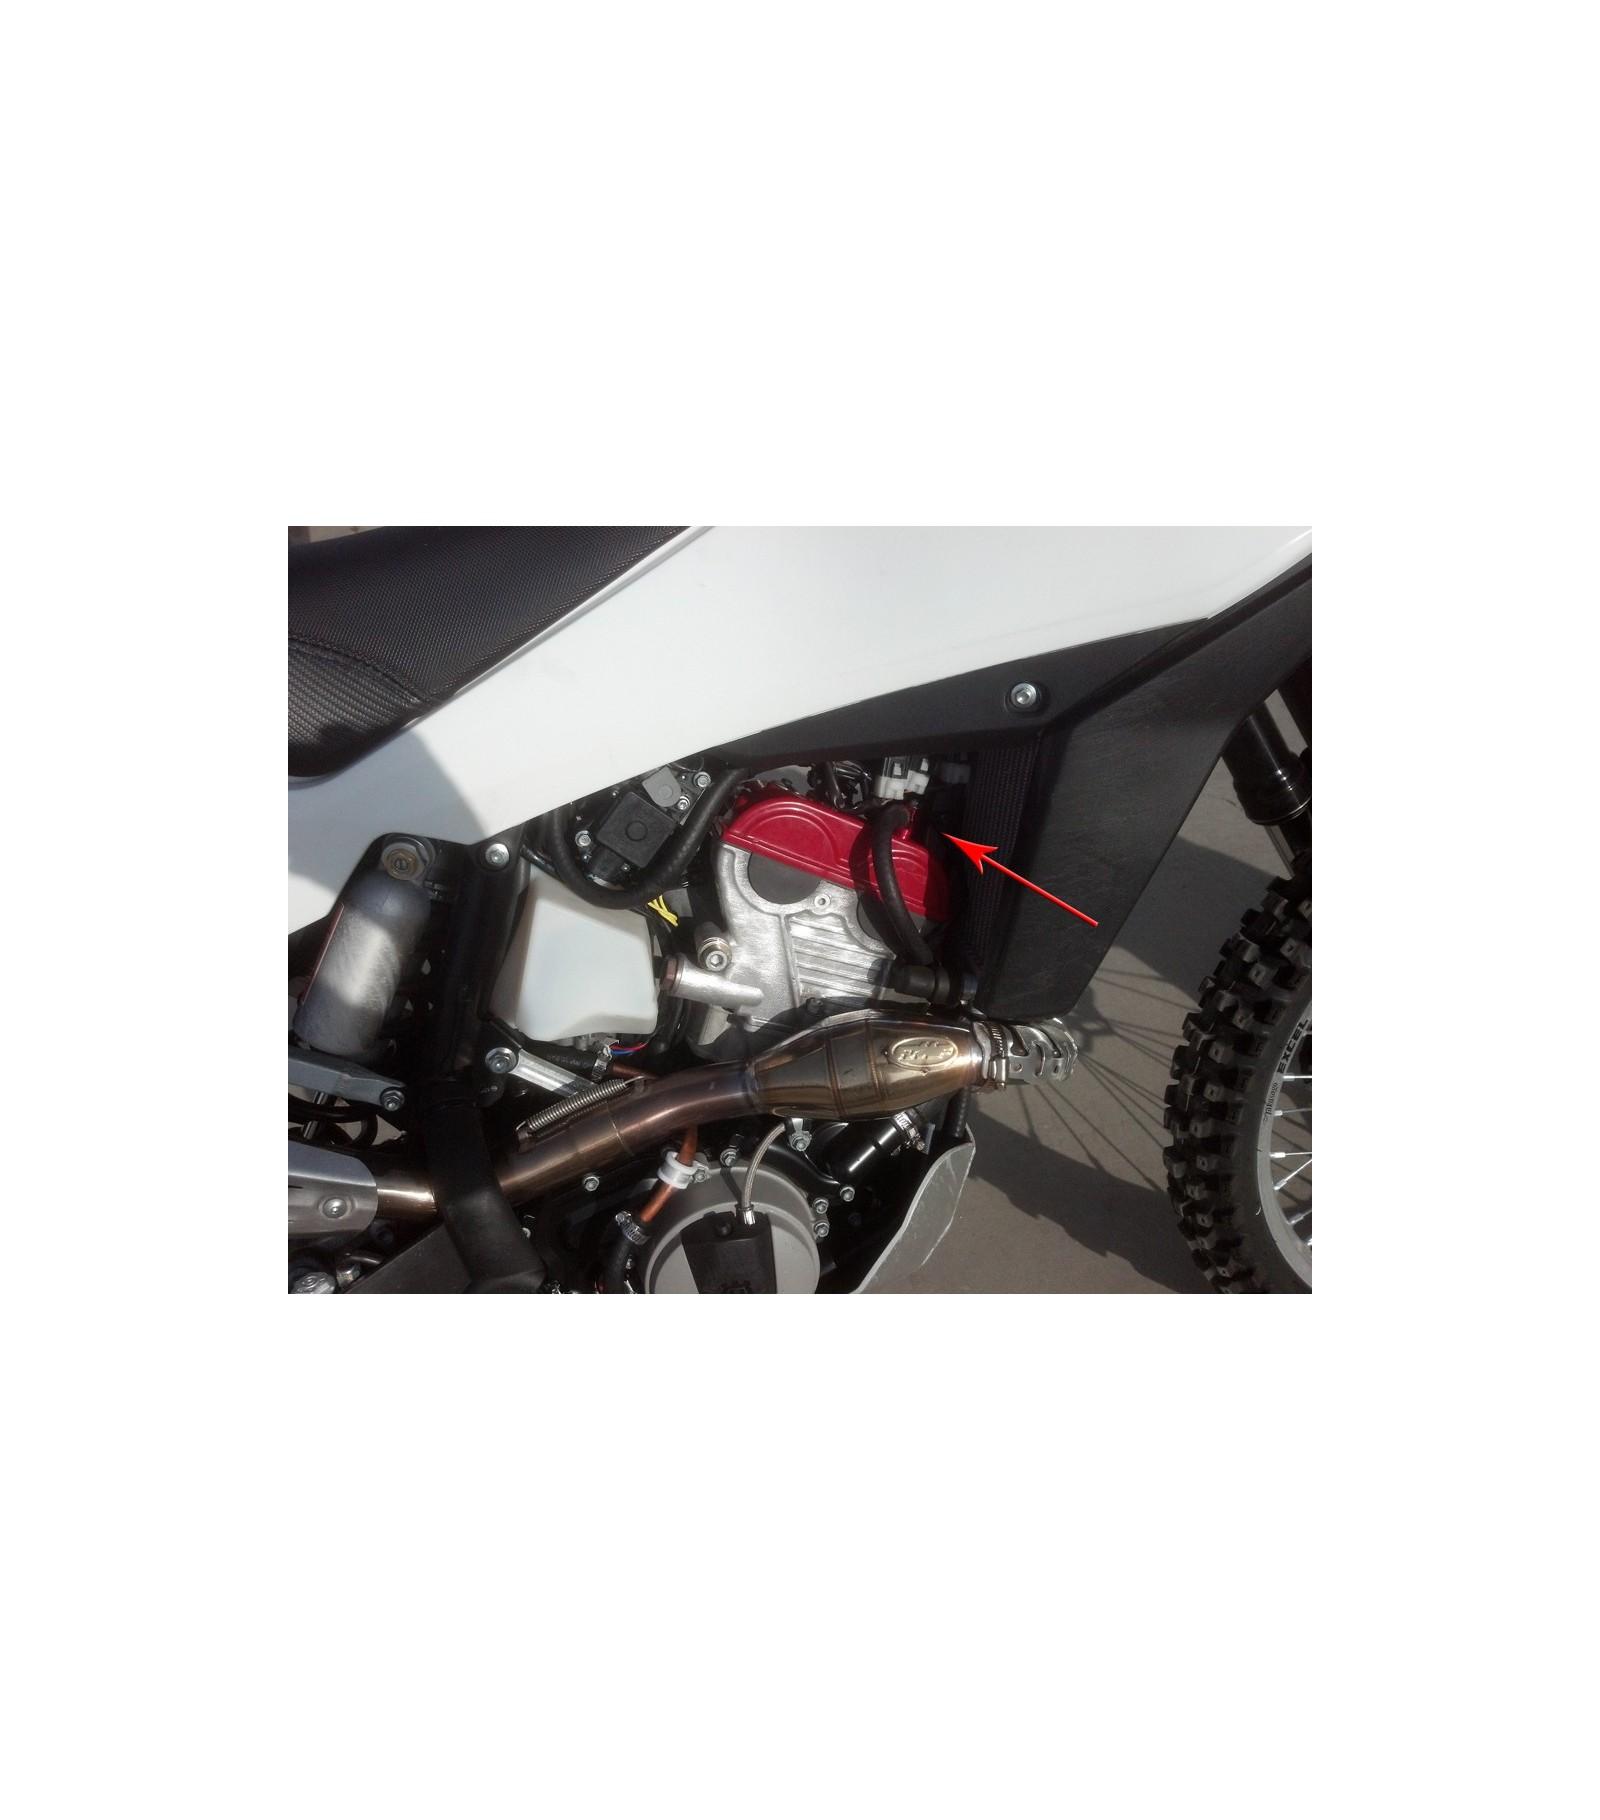 ZipTy Breather Vent Cap - 449/511 & G450X - Toxic Moto Racing